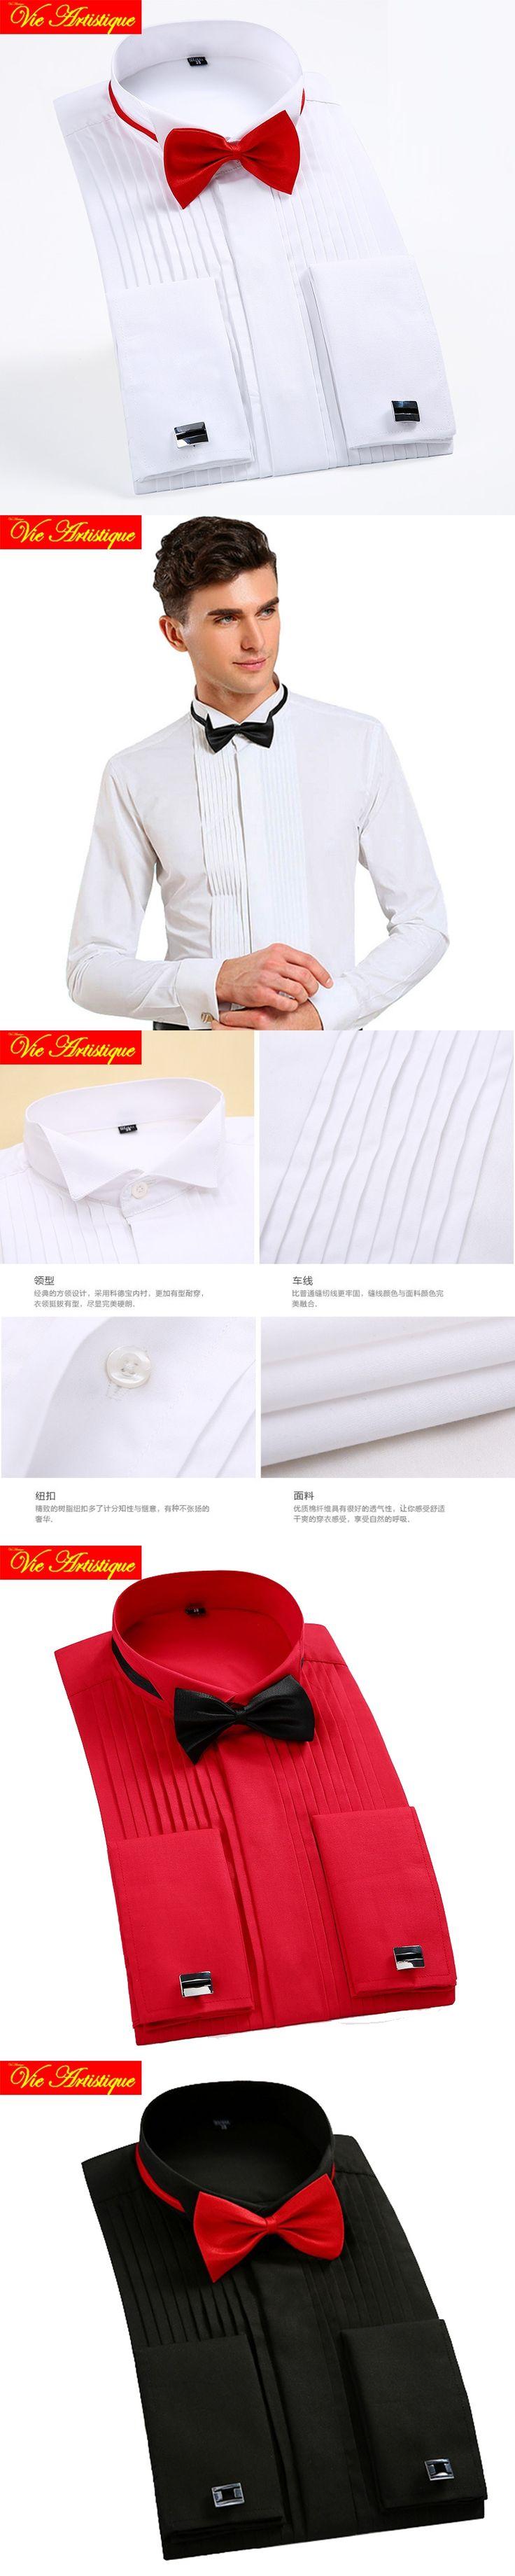 men wedding shirts male long sleeve tuxedo Groom dress shirts big size 678910 XL french cuff red white black cottonblend 2018 VA